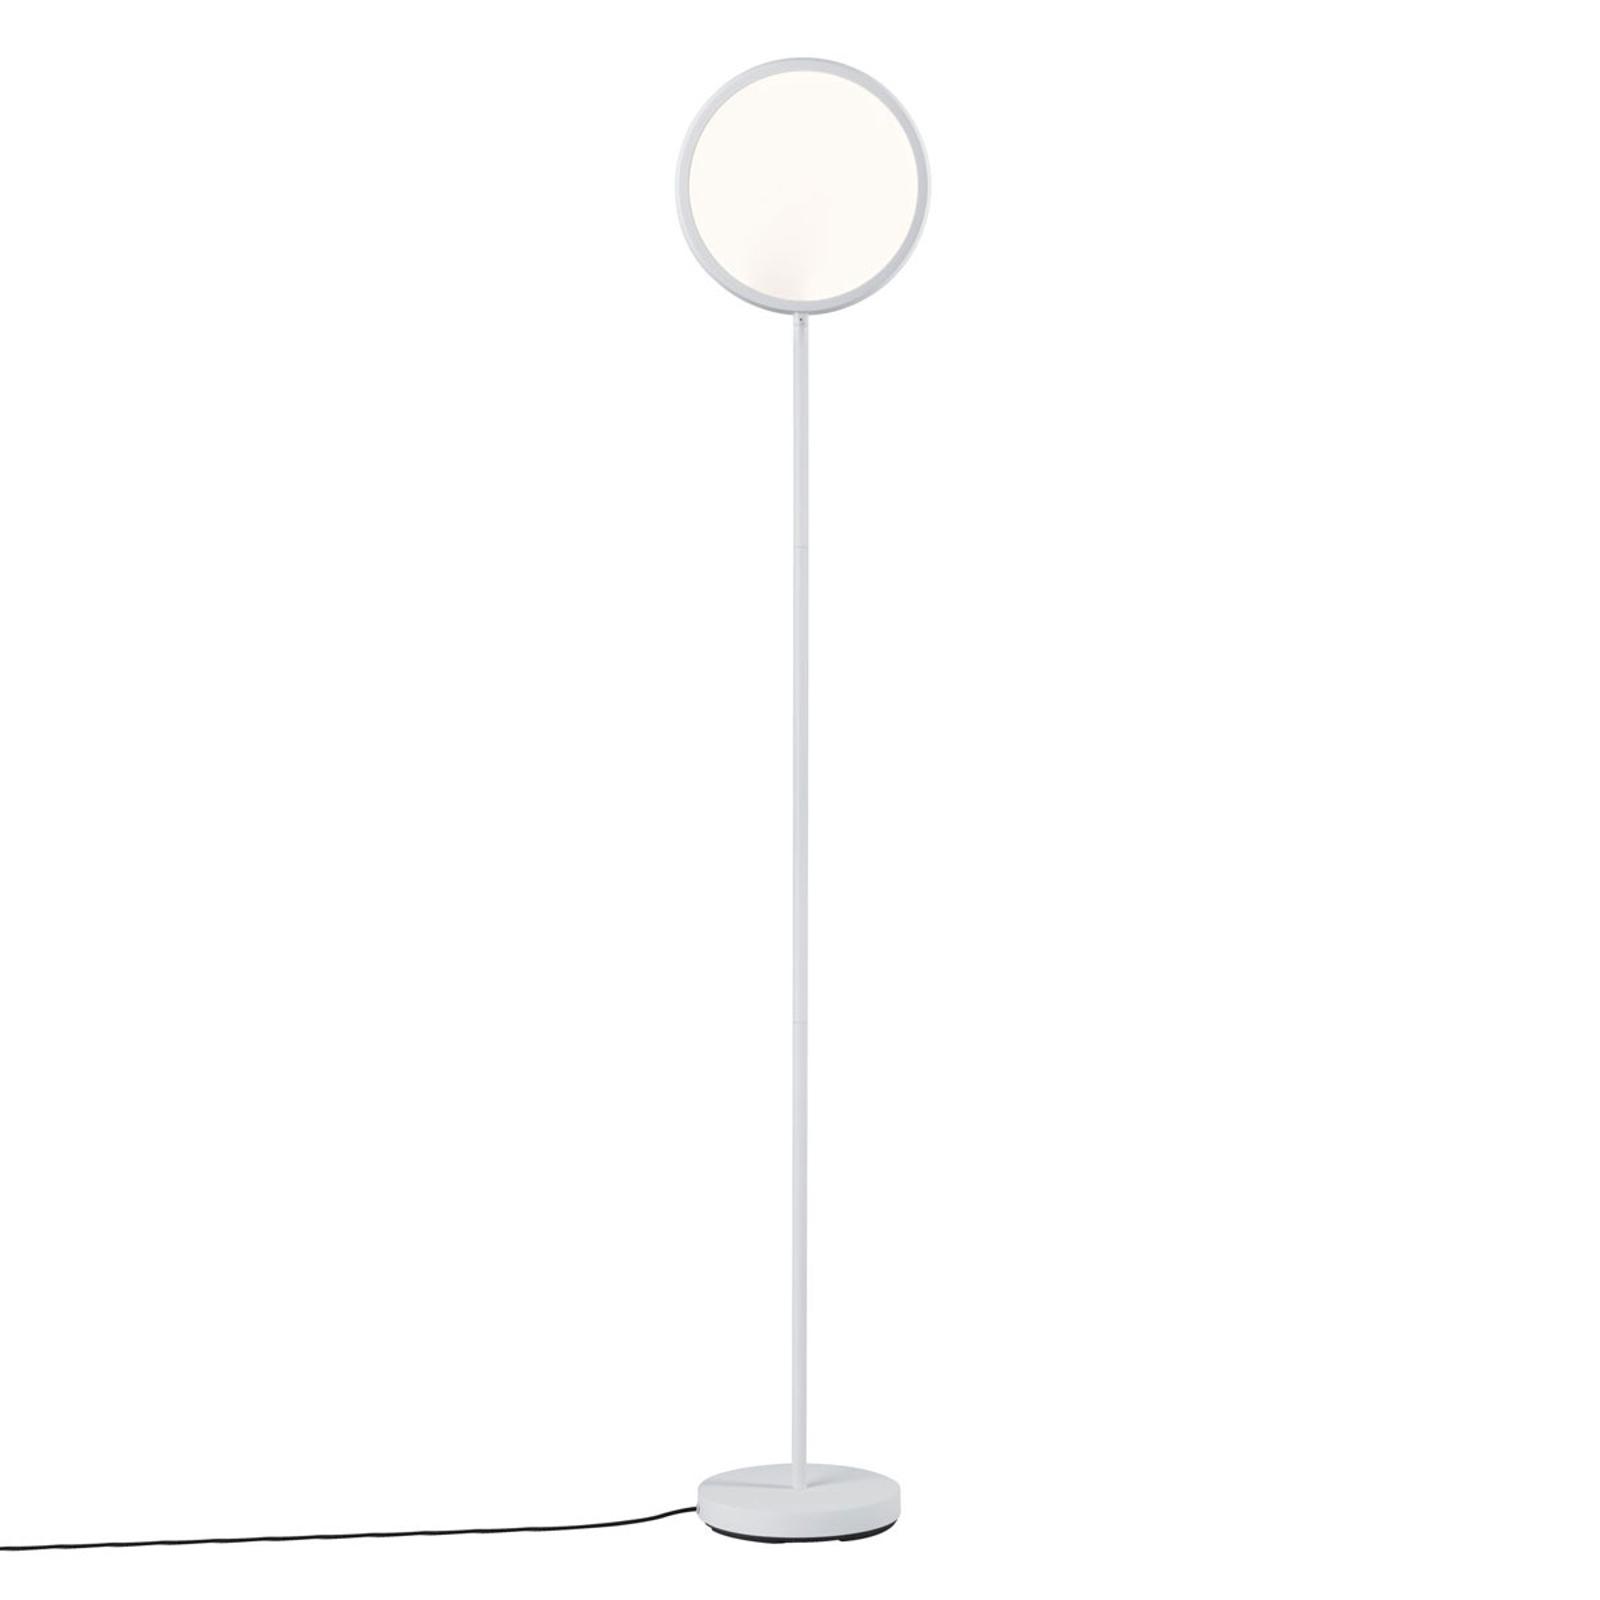 Paulmann Arik LED-Stehleuchte